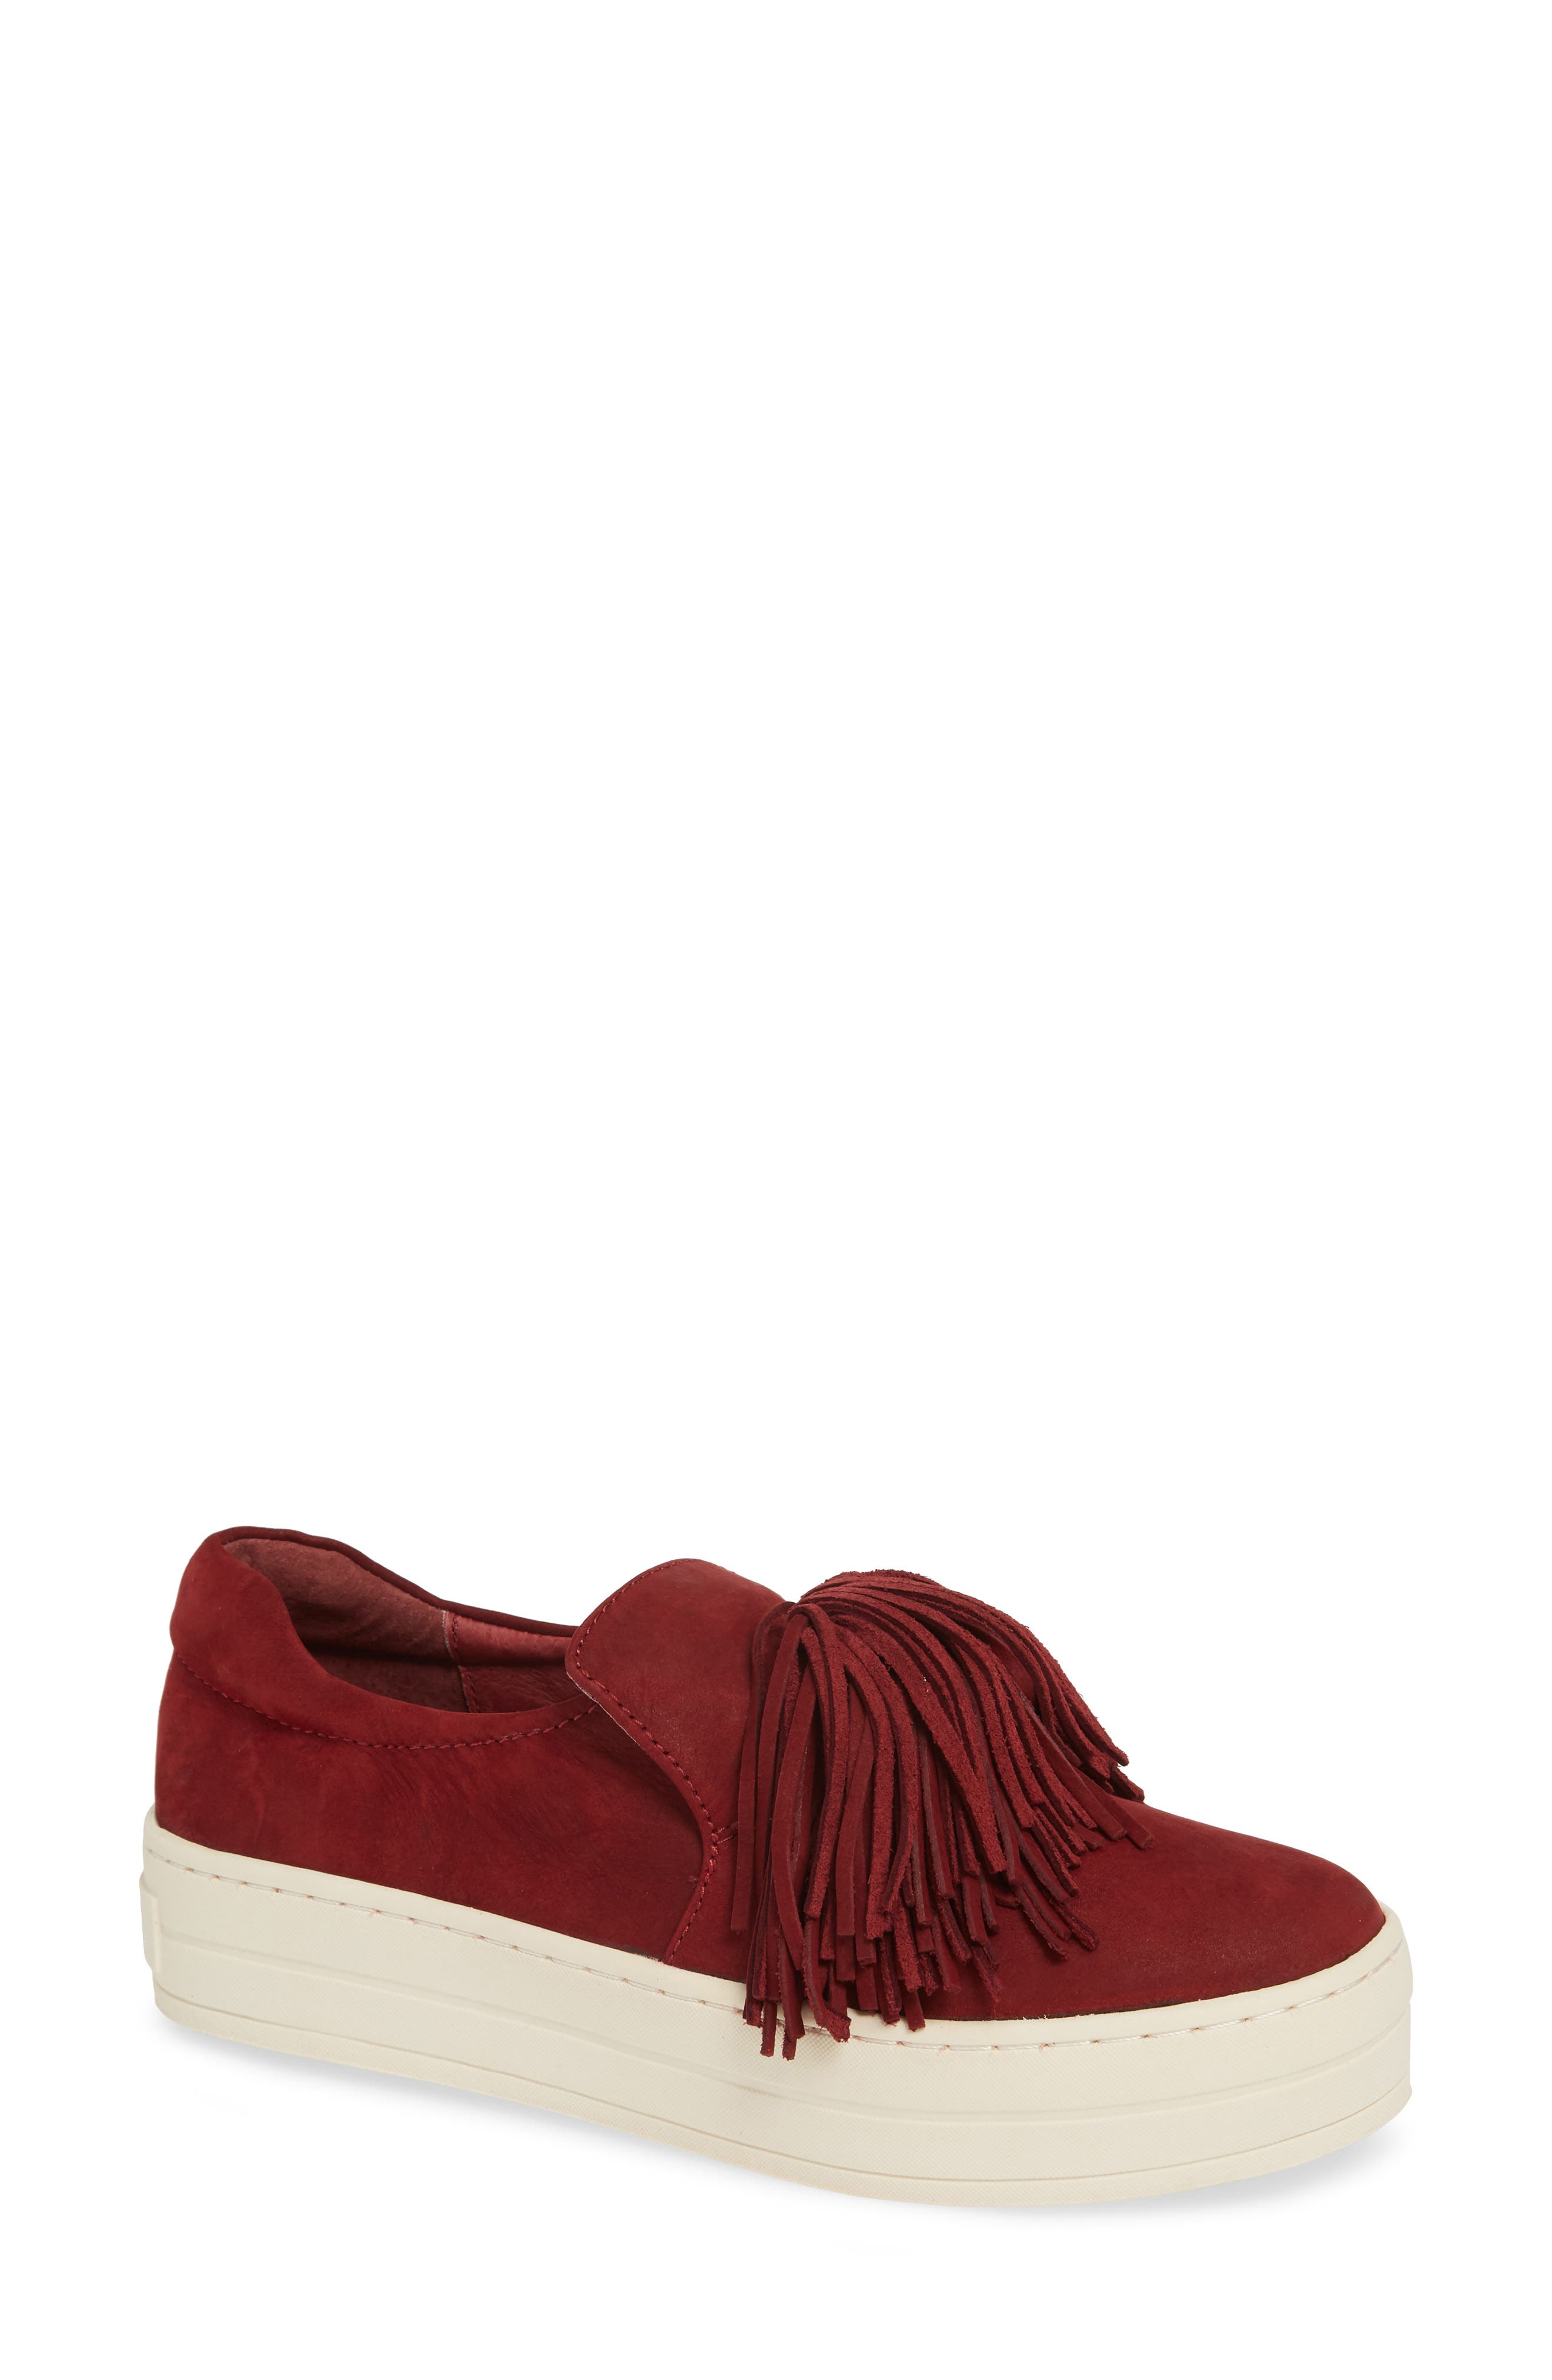 Jslides Hope Slip-On Sneaker, Red